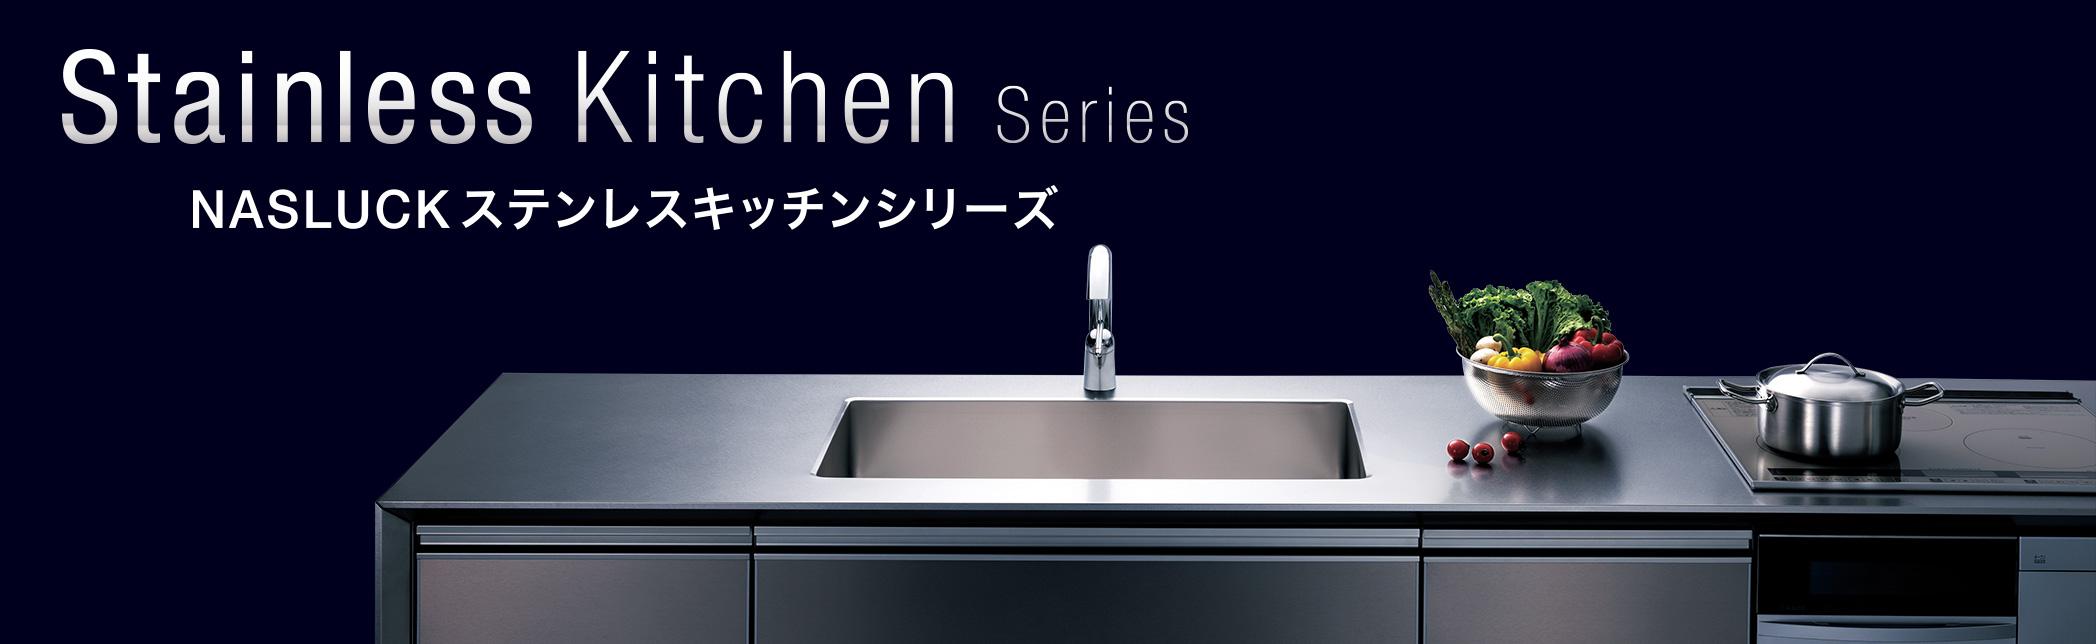 NASLUCKステンレスキッチンシリーズ